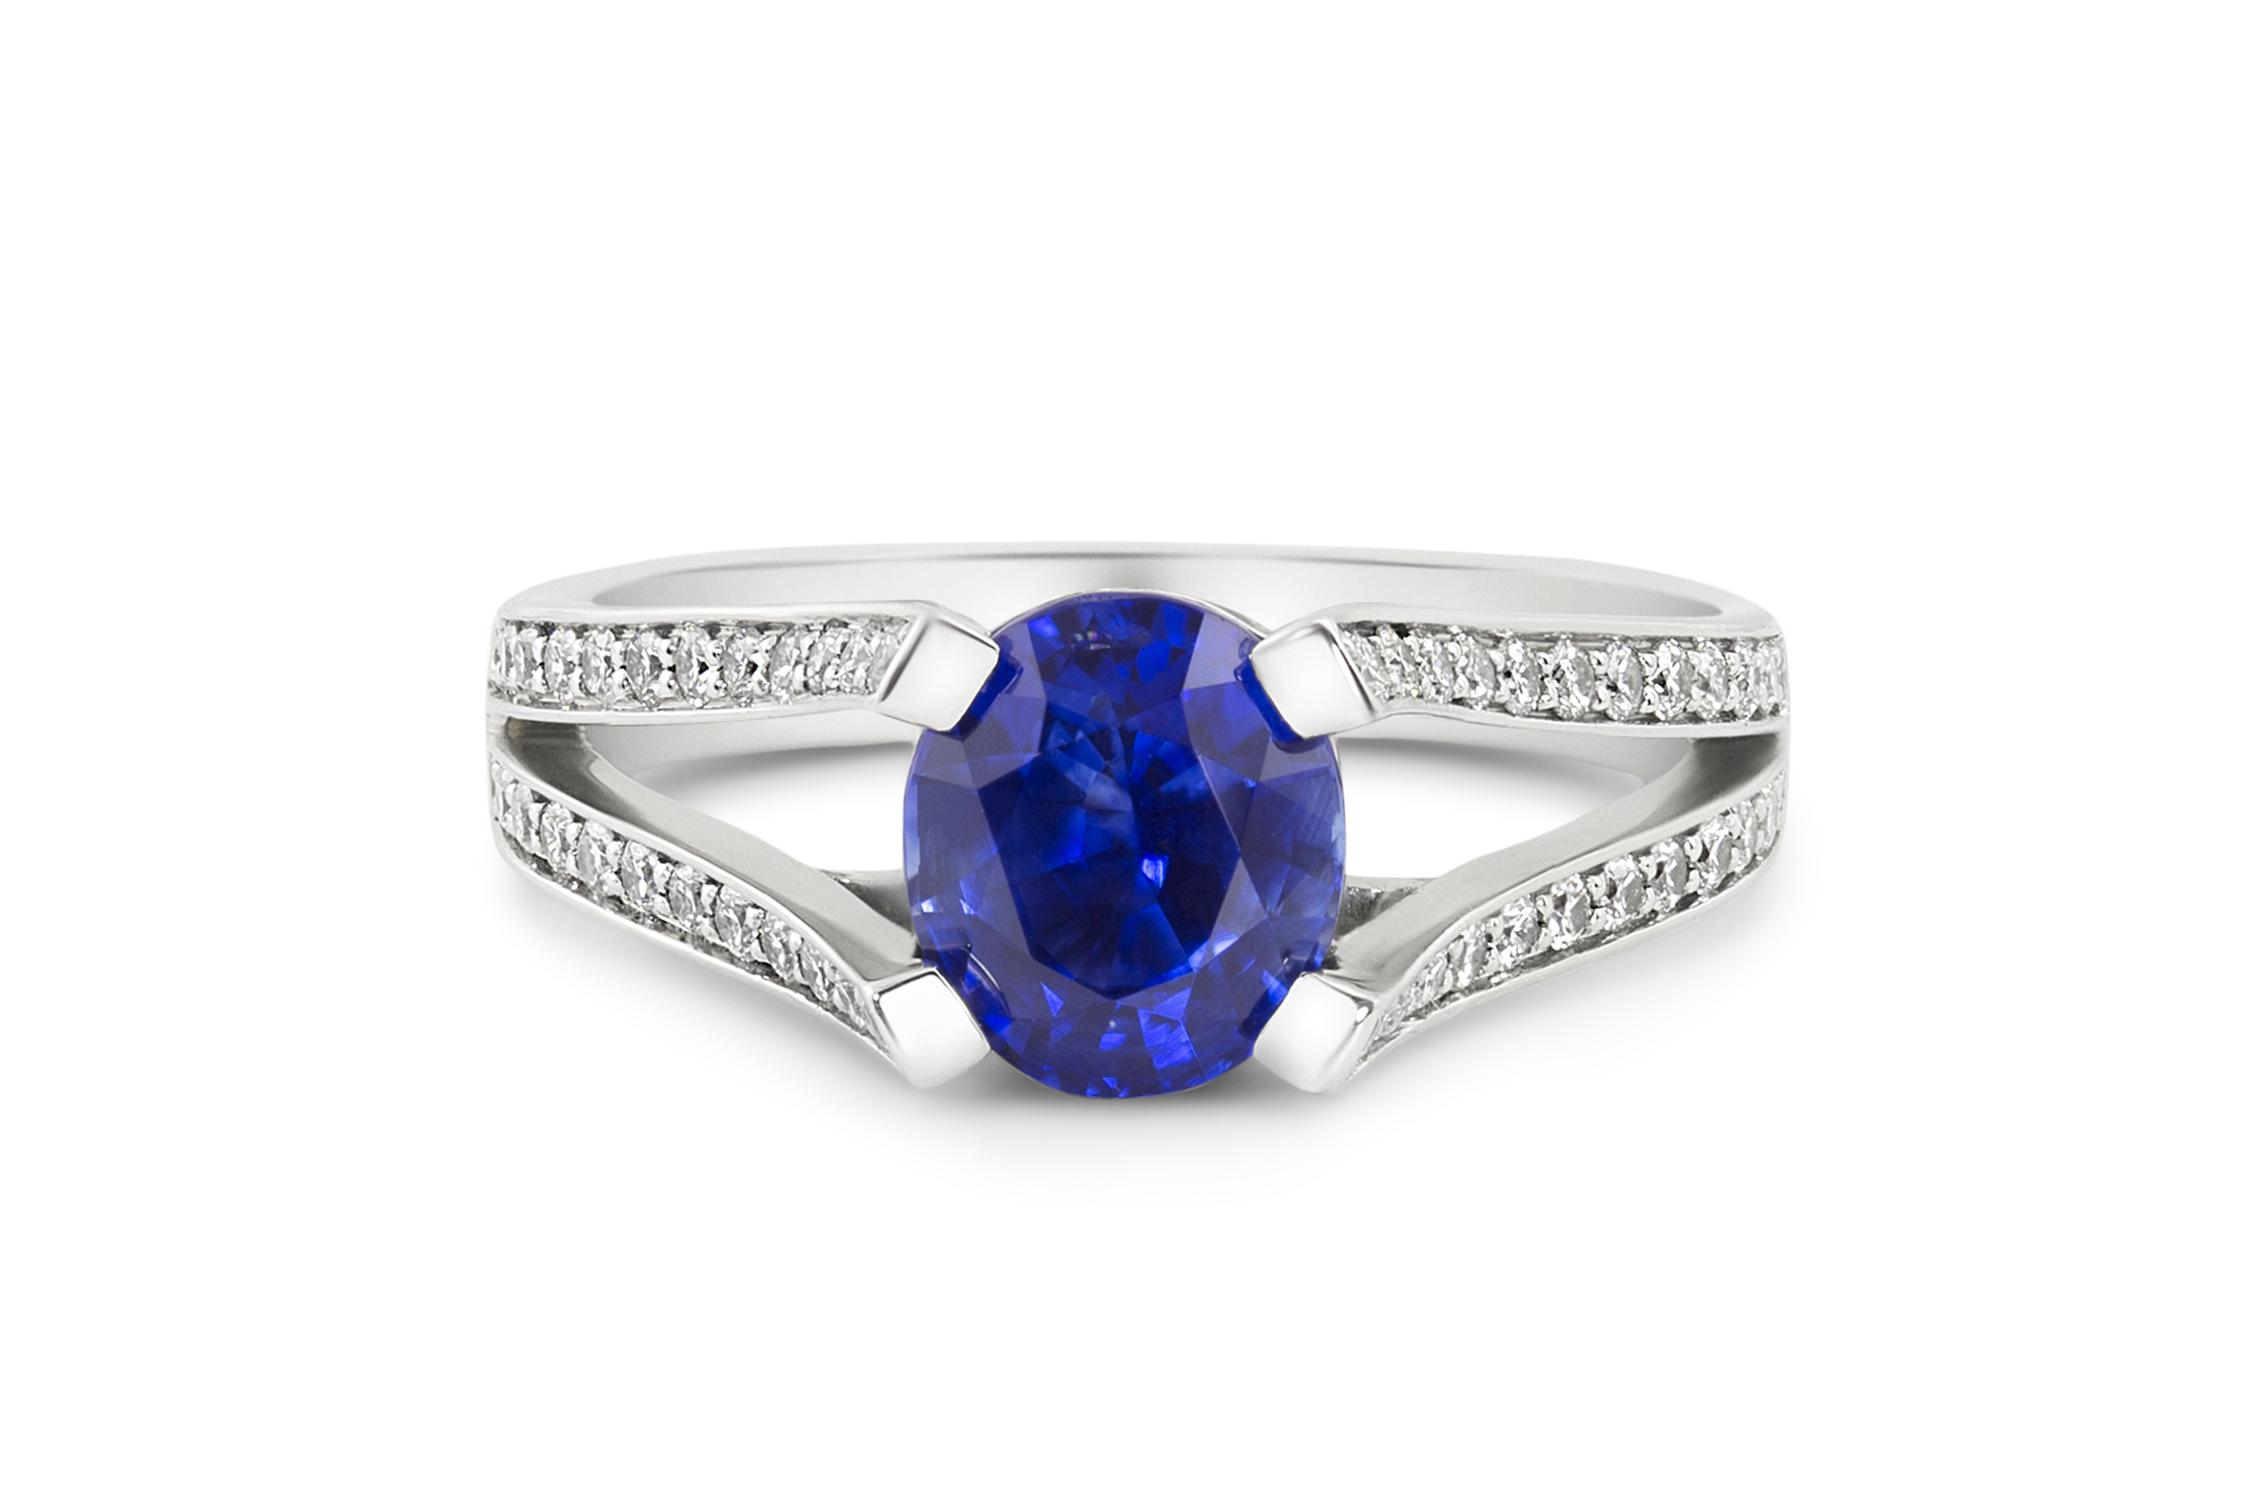 Platinum, diamond and sapphire ring ~ Ann Elizabeth Jewelry ~ 2.03ct Oval Brilliant Sapphire from Madagascar